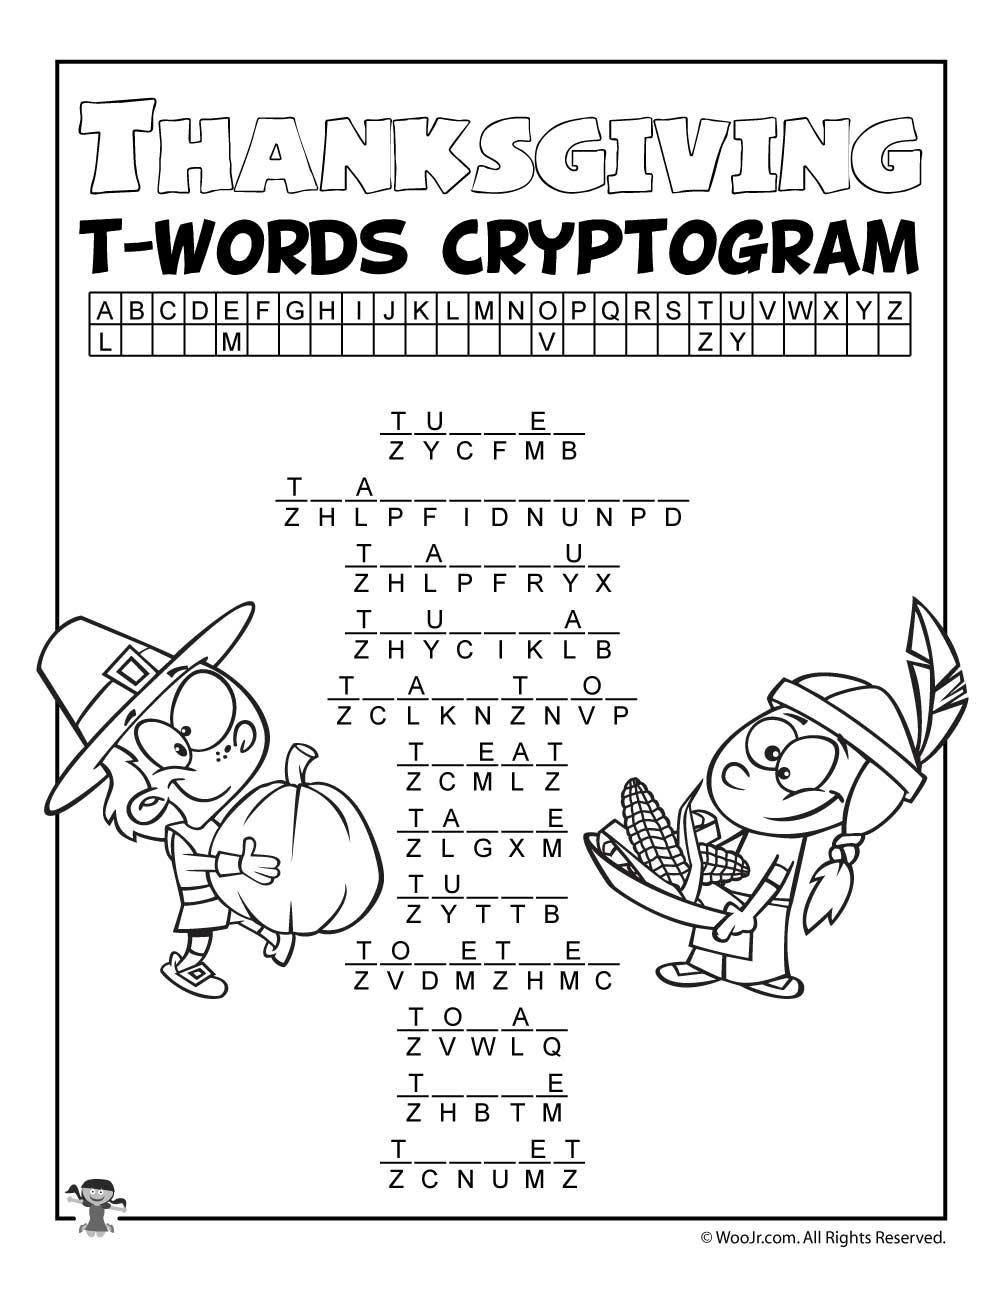 Thanksgiving Letter T Words Cryptogram